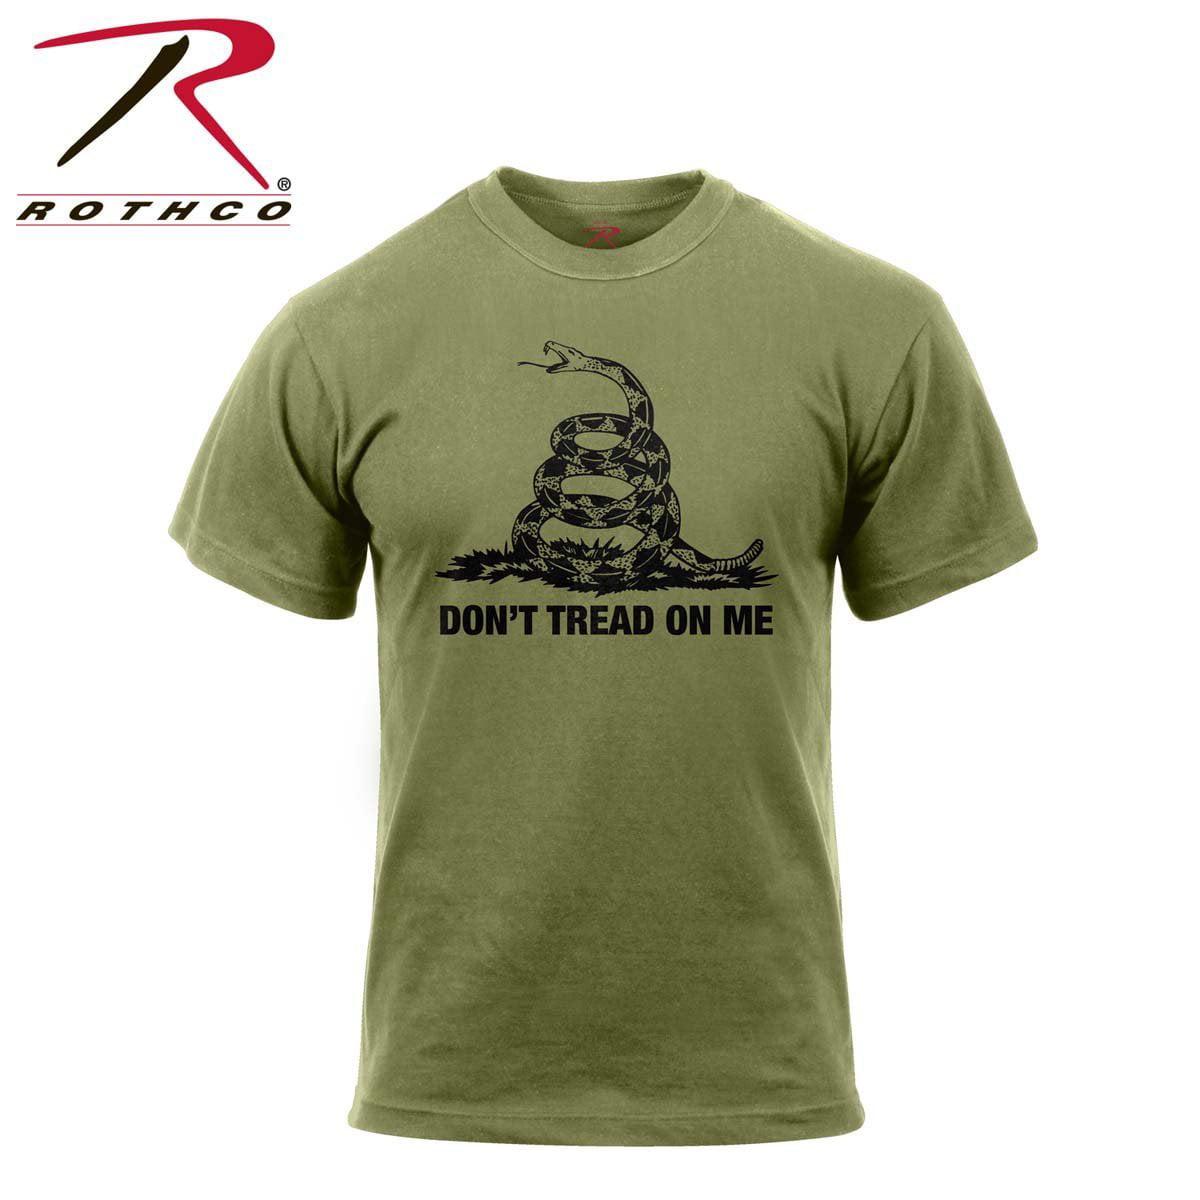 4041d5016fa Rothco Don't Tread On Me Vintage T-Shirt - Black, Large | Walmart Canada ?